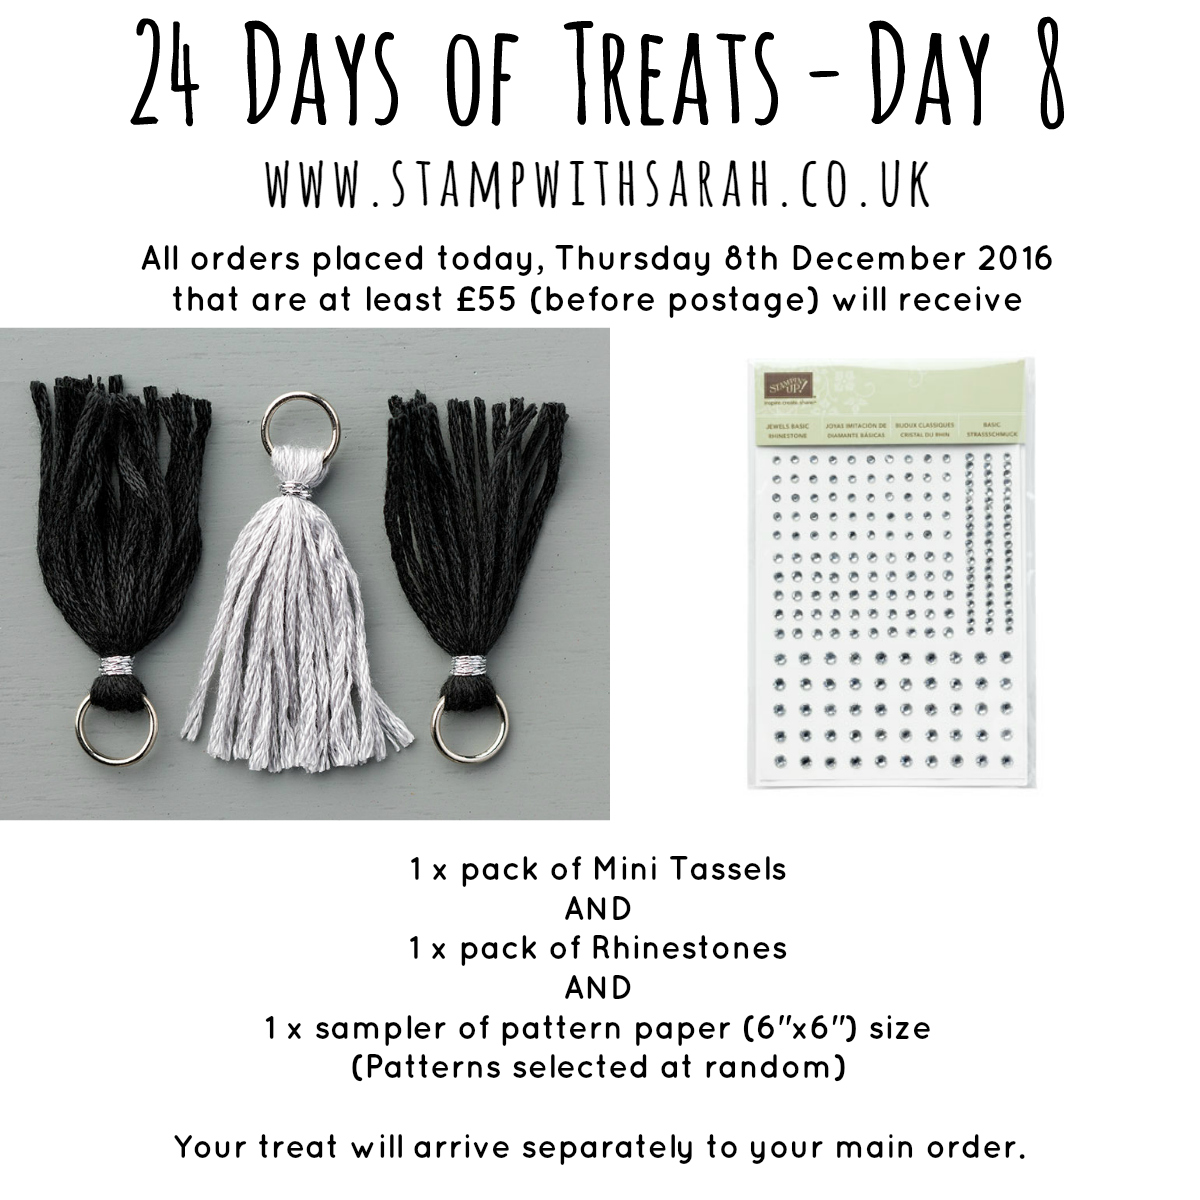 24-days-of-treats-day-8